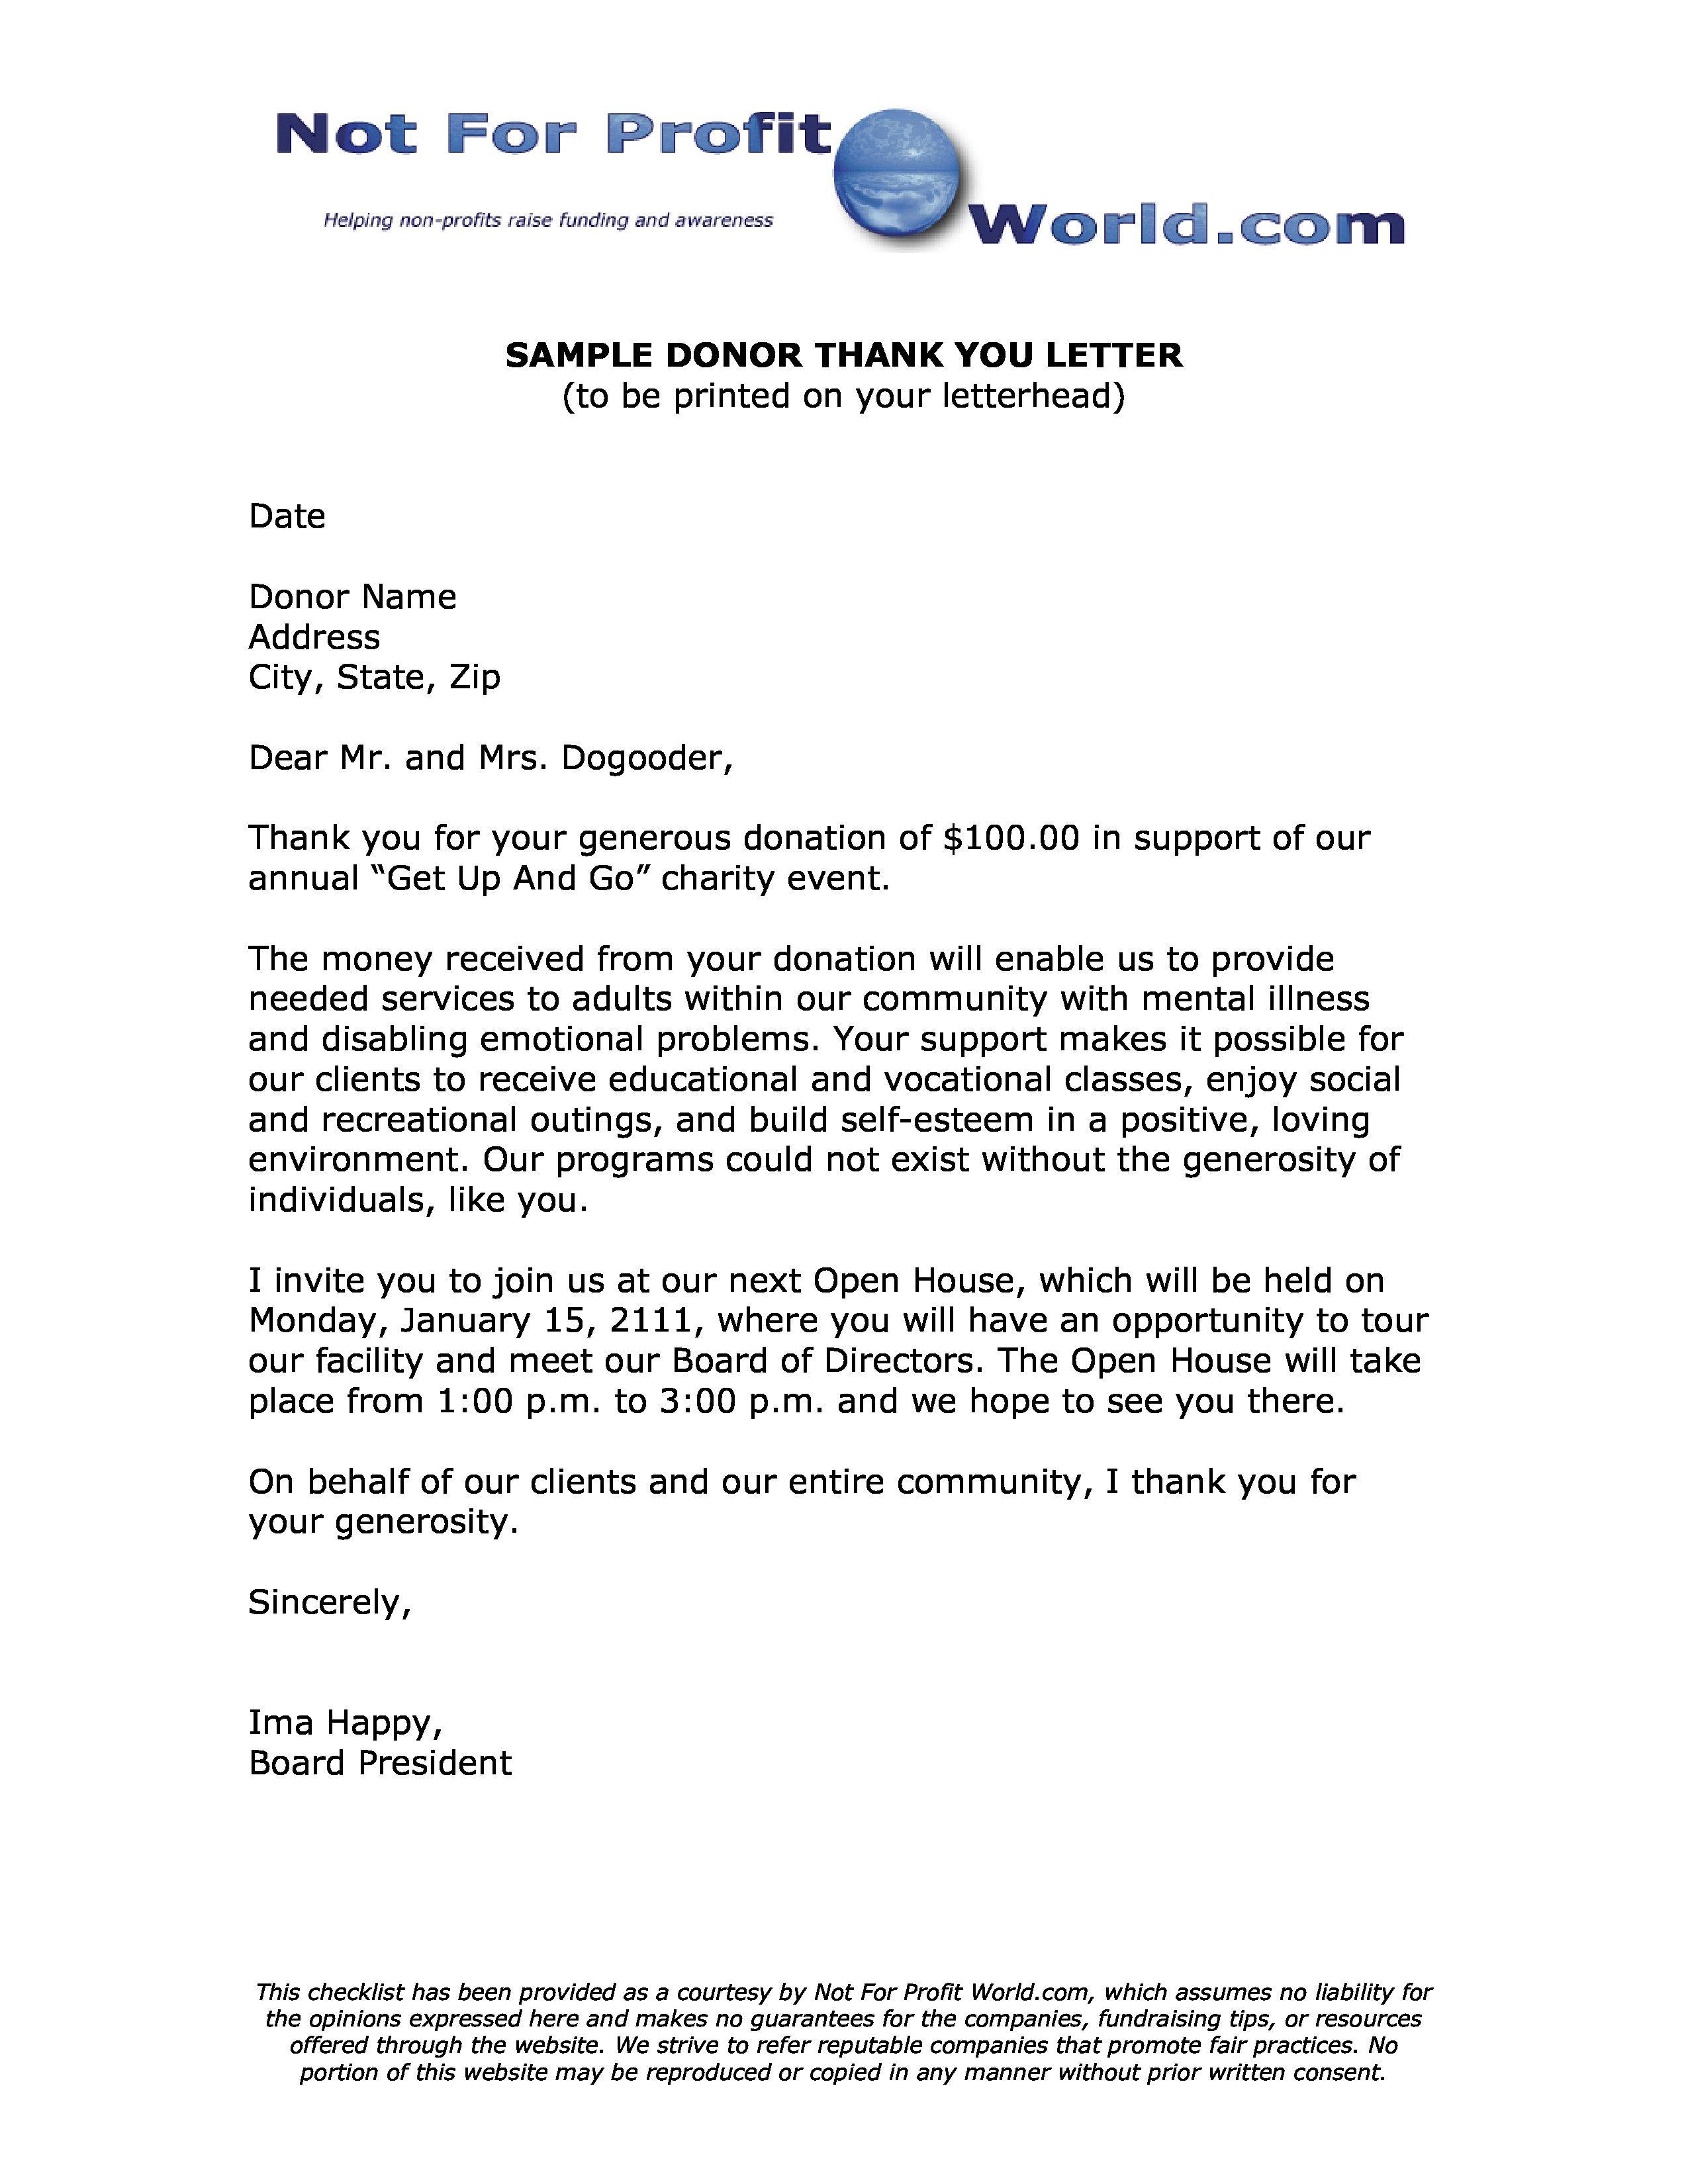 50 Non Profit Thank You Letter Hc7k Di